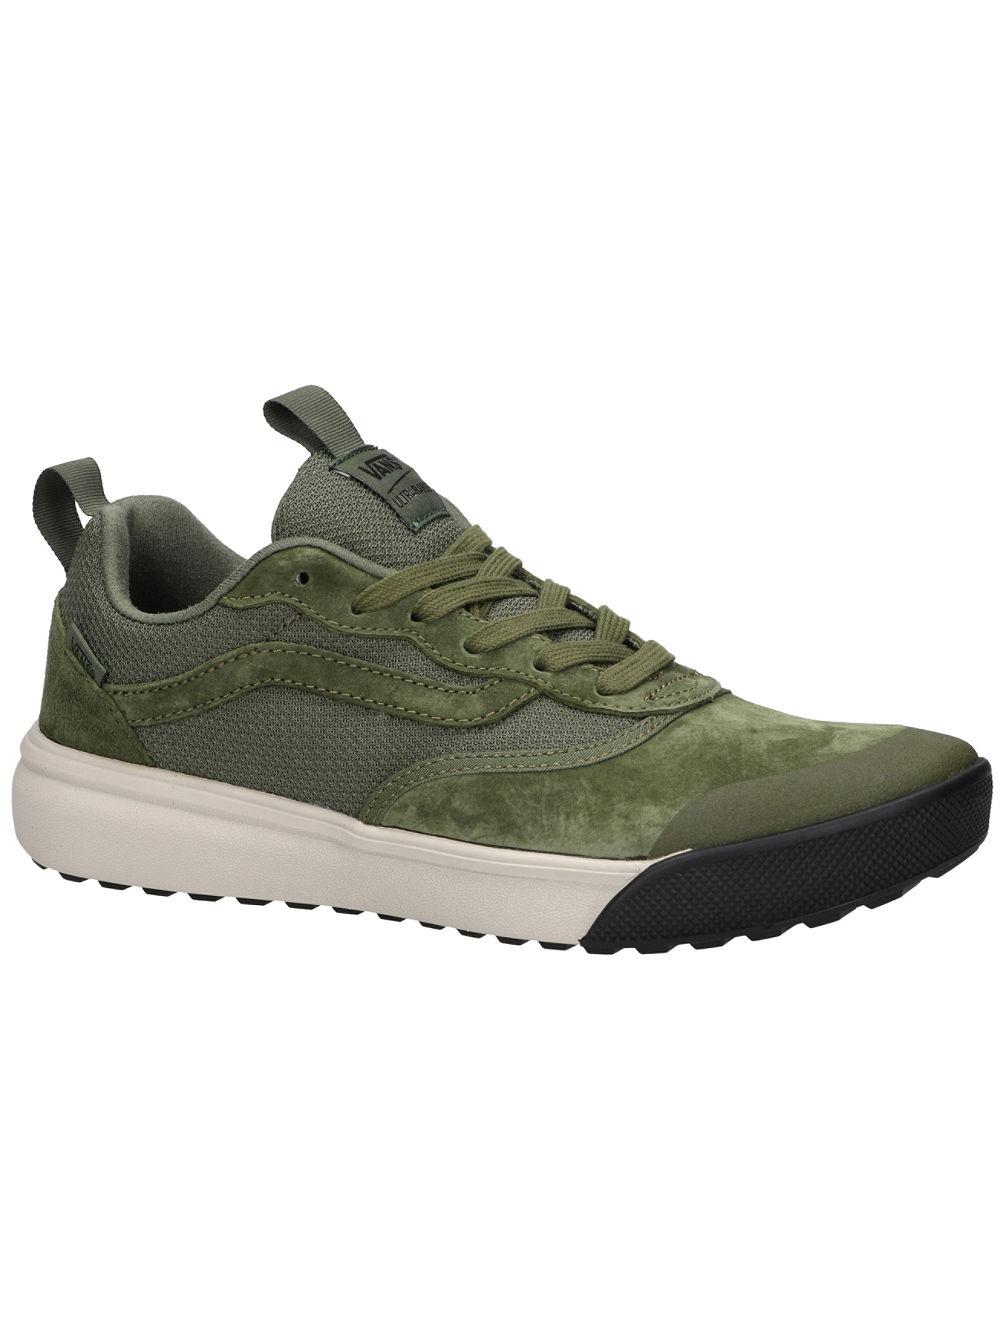 2411db59522a Buy Vans UltraRange MTE Shoes online at Blue Tomato